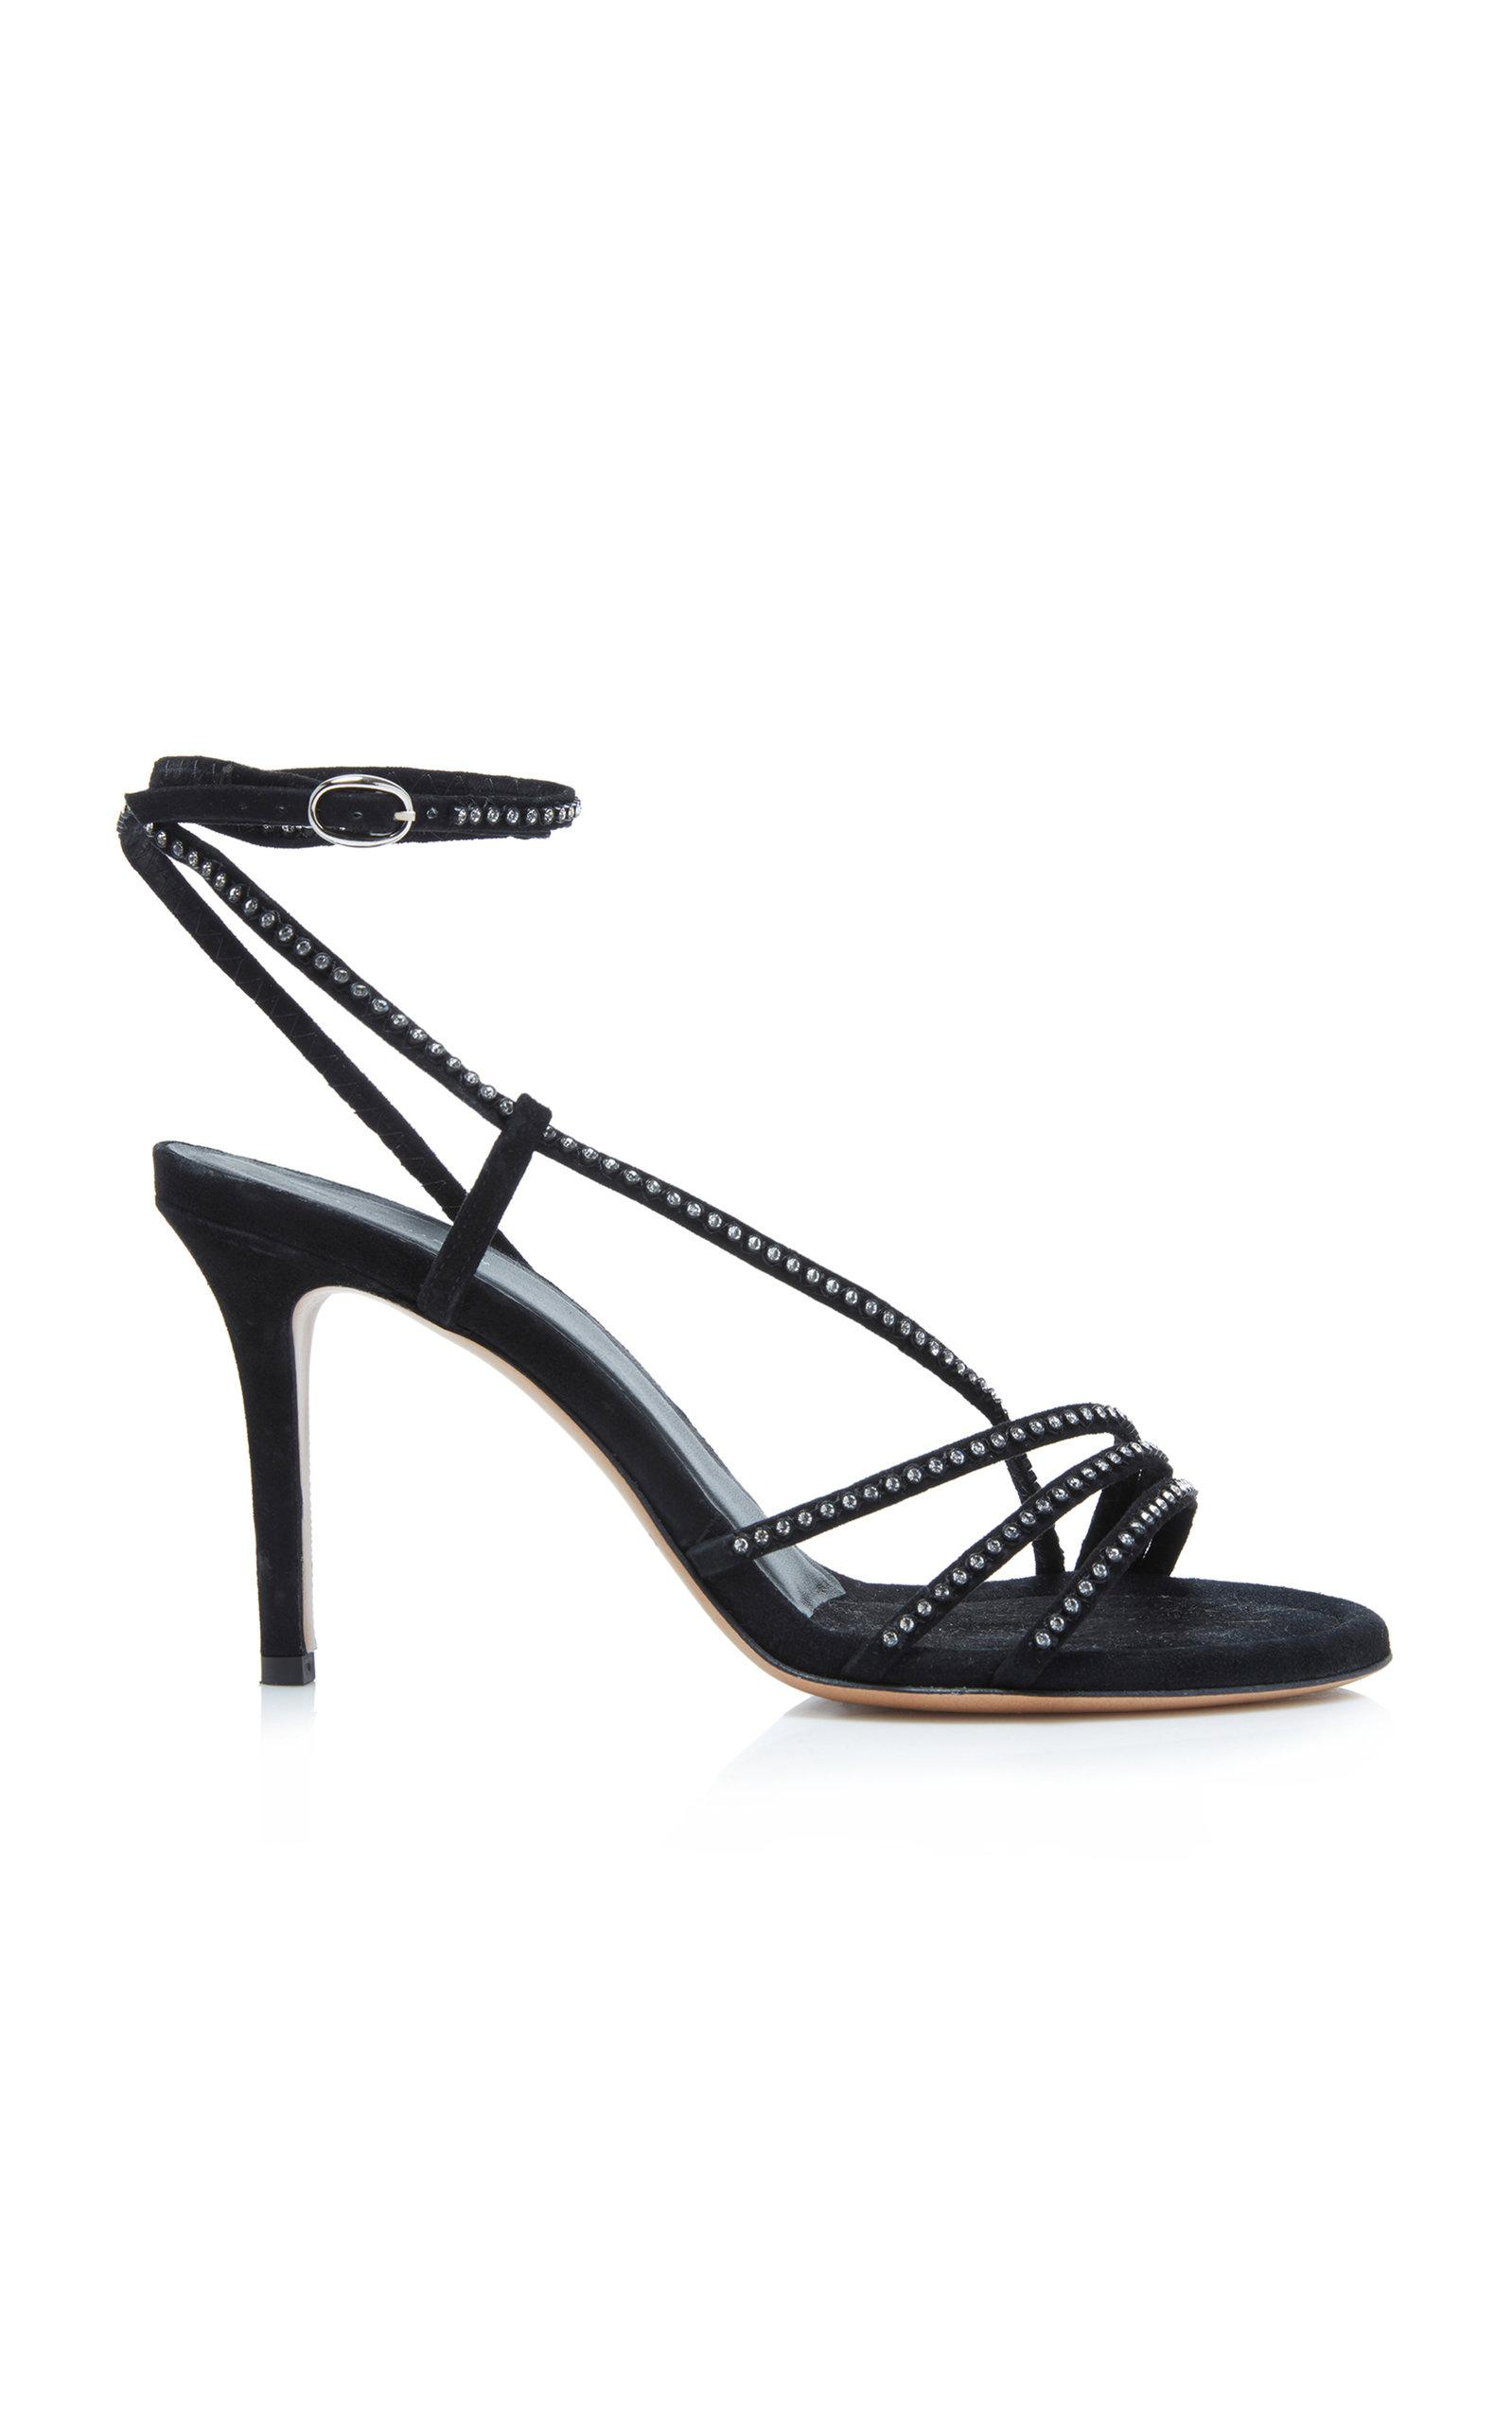 2e6e3b289a2 Lyst - Isabel Marant Amspee Crystal-embellished Suede Sandals in Black